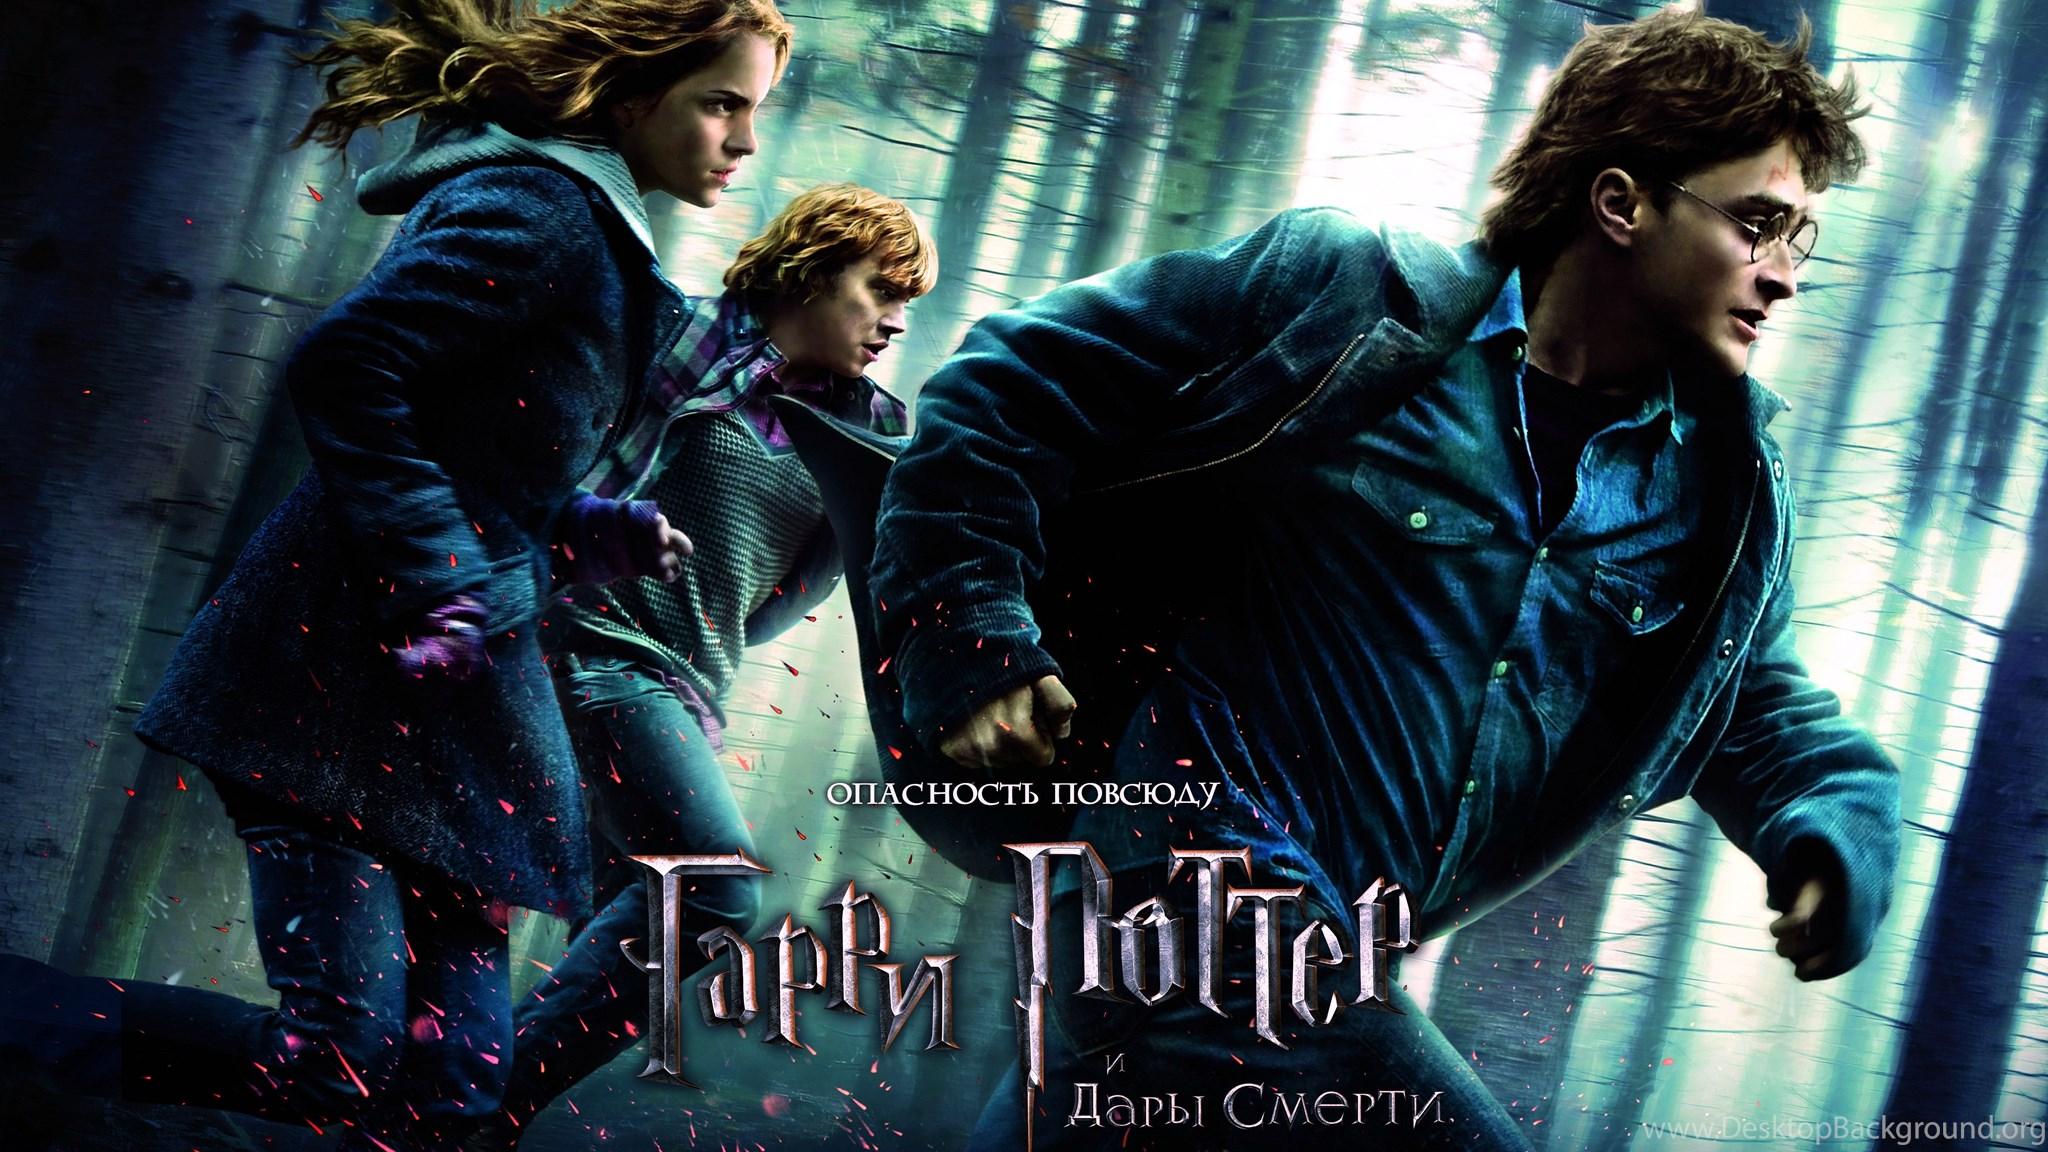 Top Wallpaper Harry Potter Dual Screen - 580289_wallpapers-harry-potter-harry-potter-and-the-deathly-hallows_6000x3632_h  Image_426047.jpg